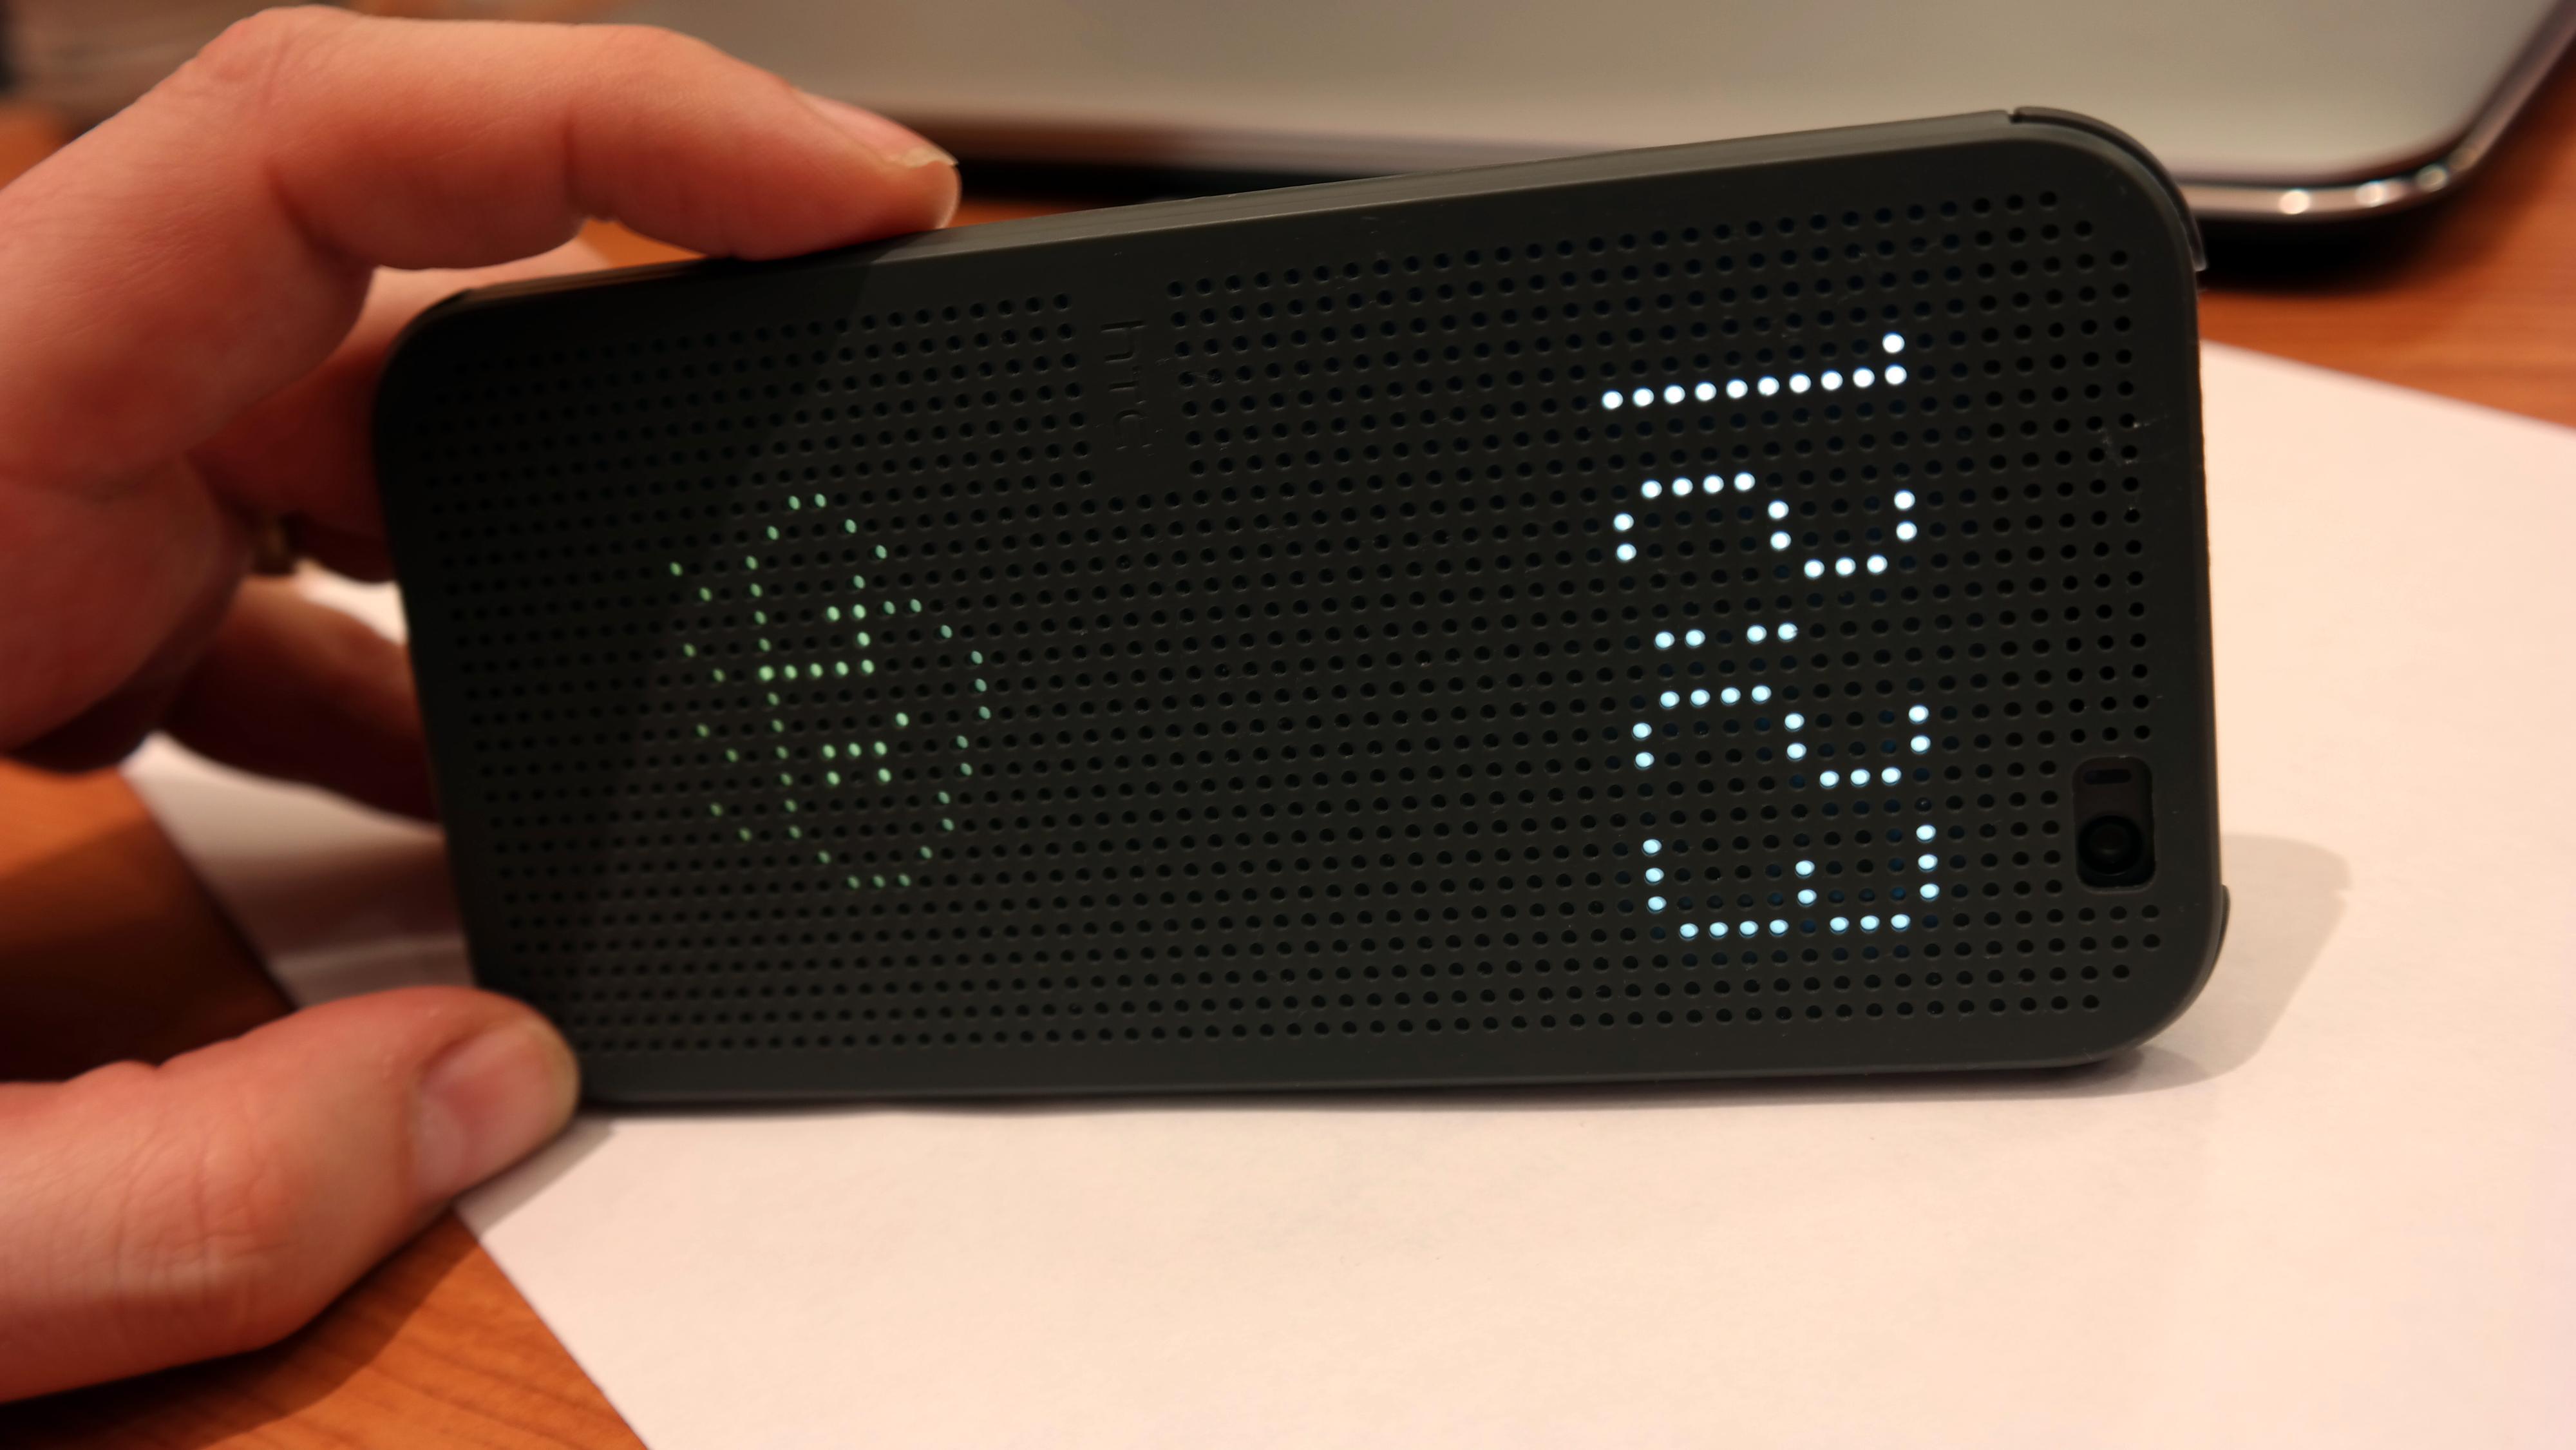 Mobildeksel til HTC One M8.Foto: Espen Swang, Amobil.no